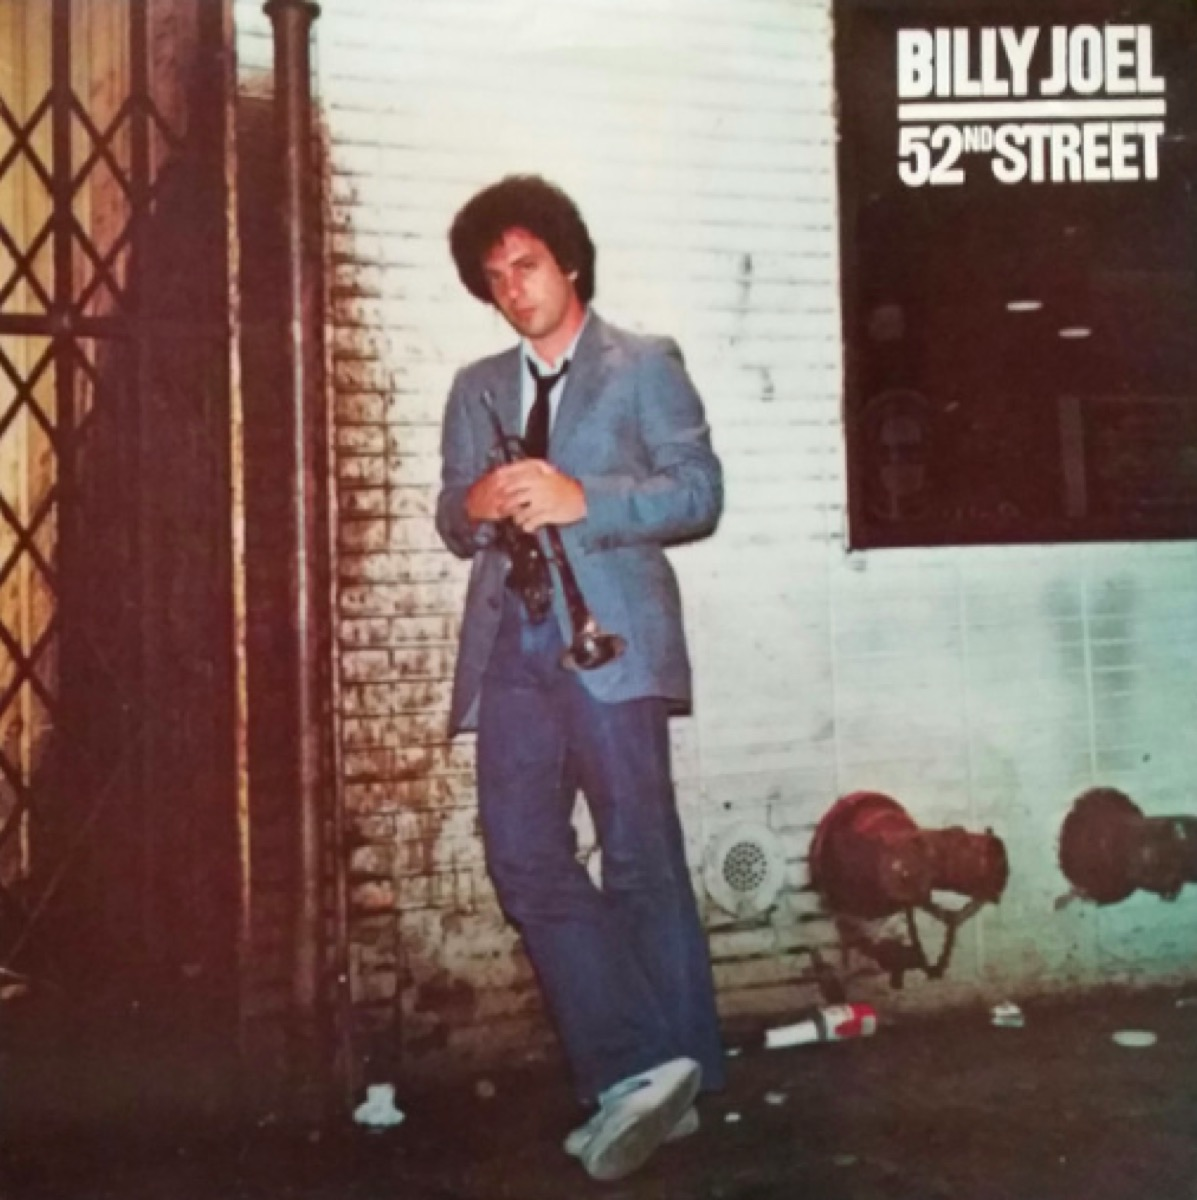 52nd Street Billy Joel album